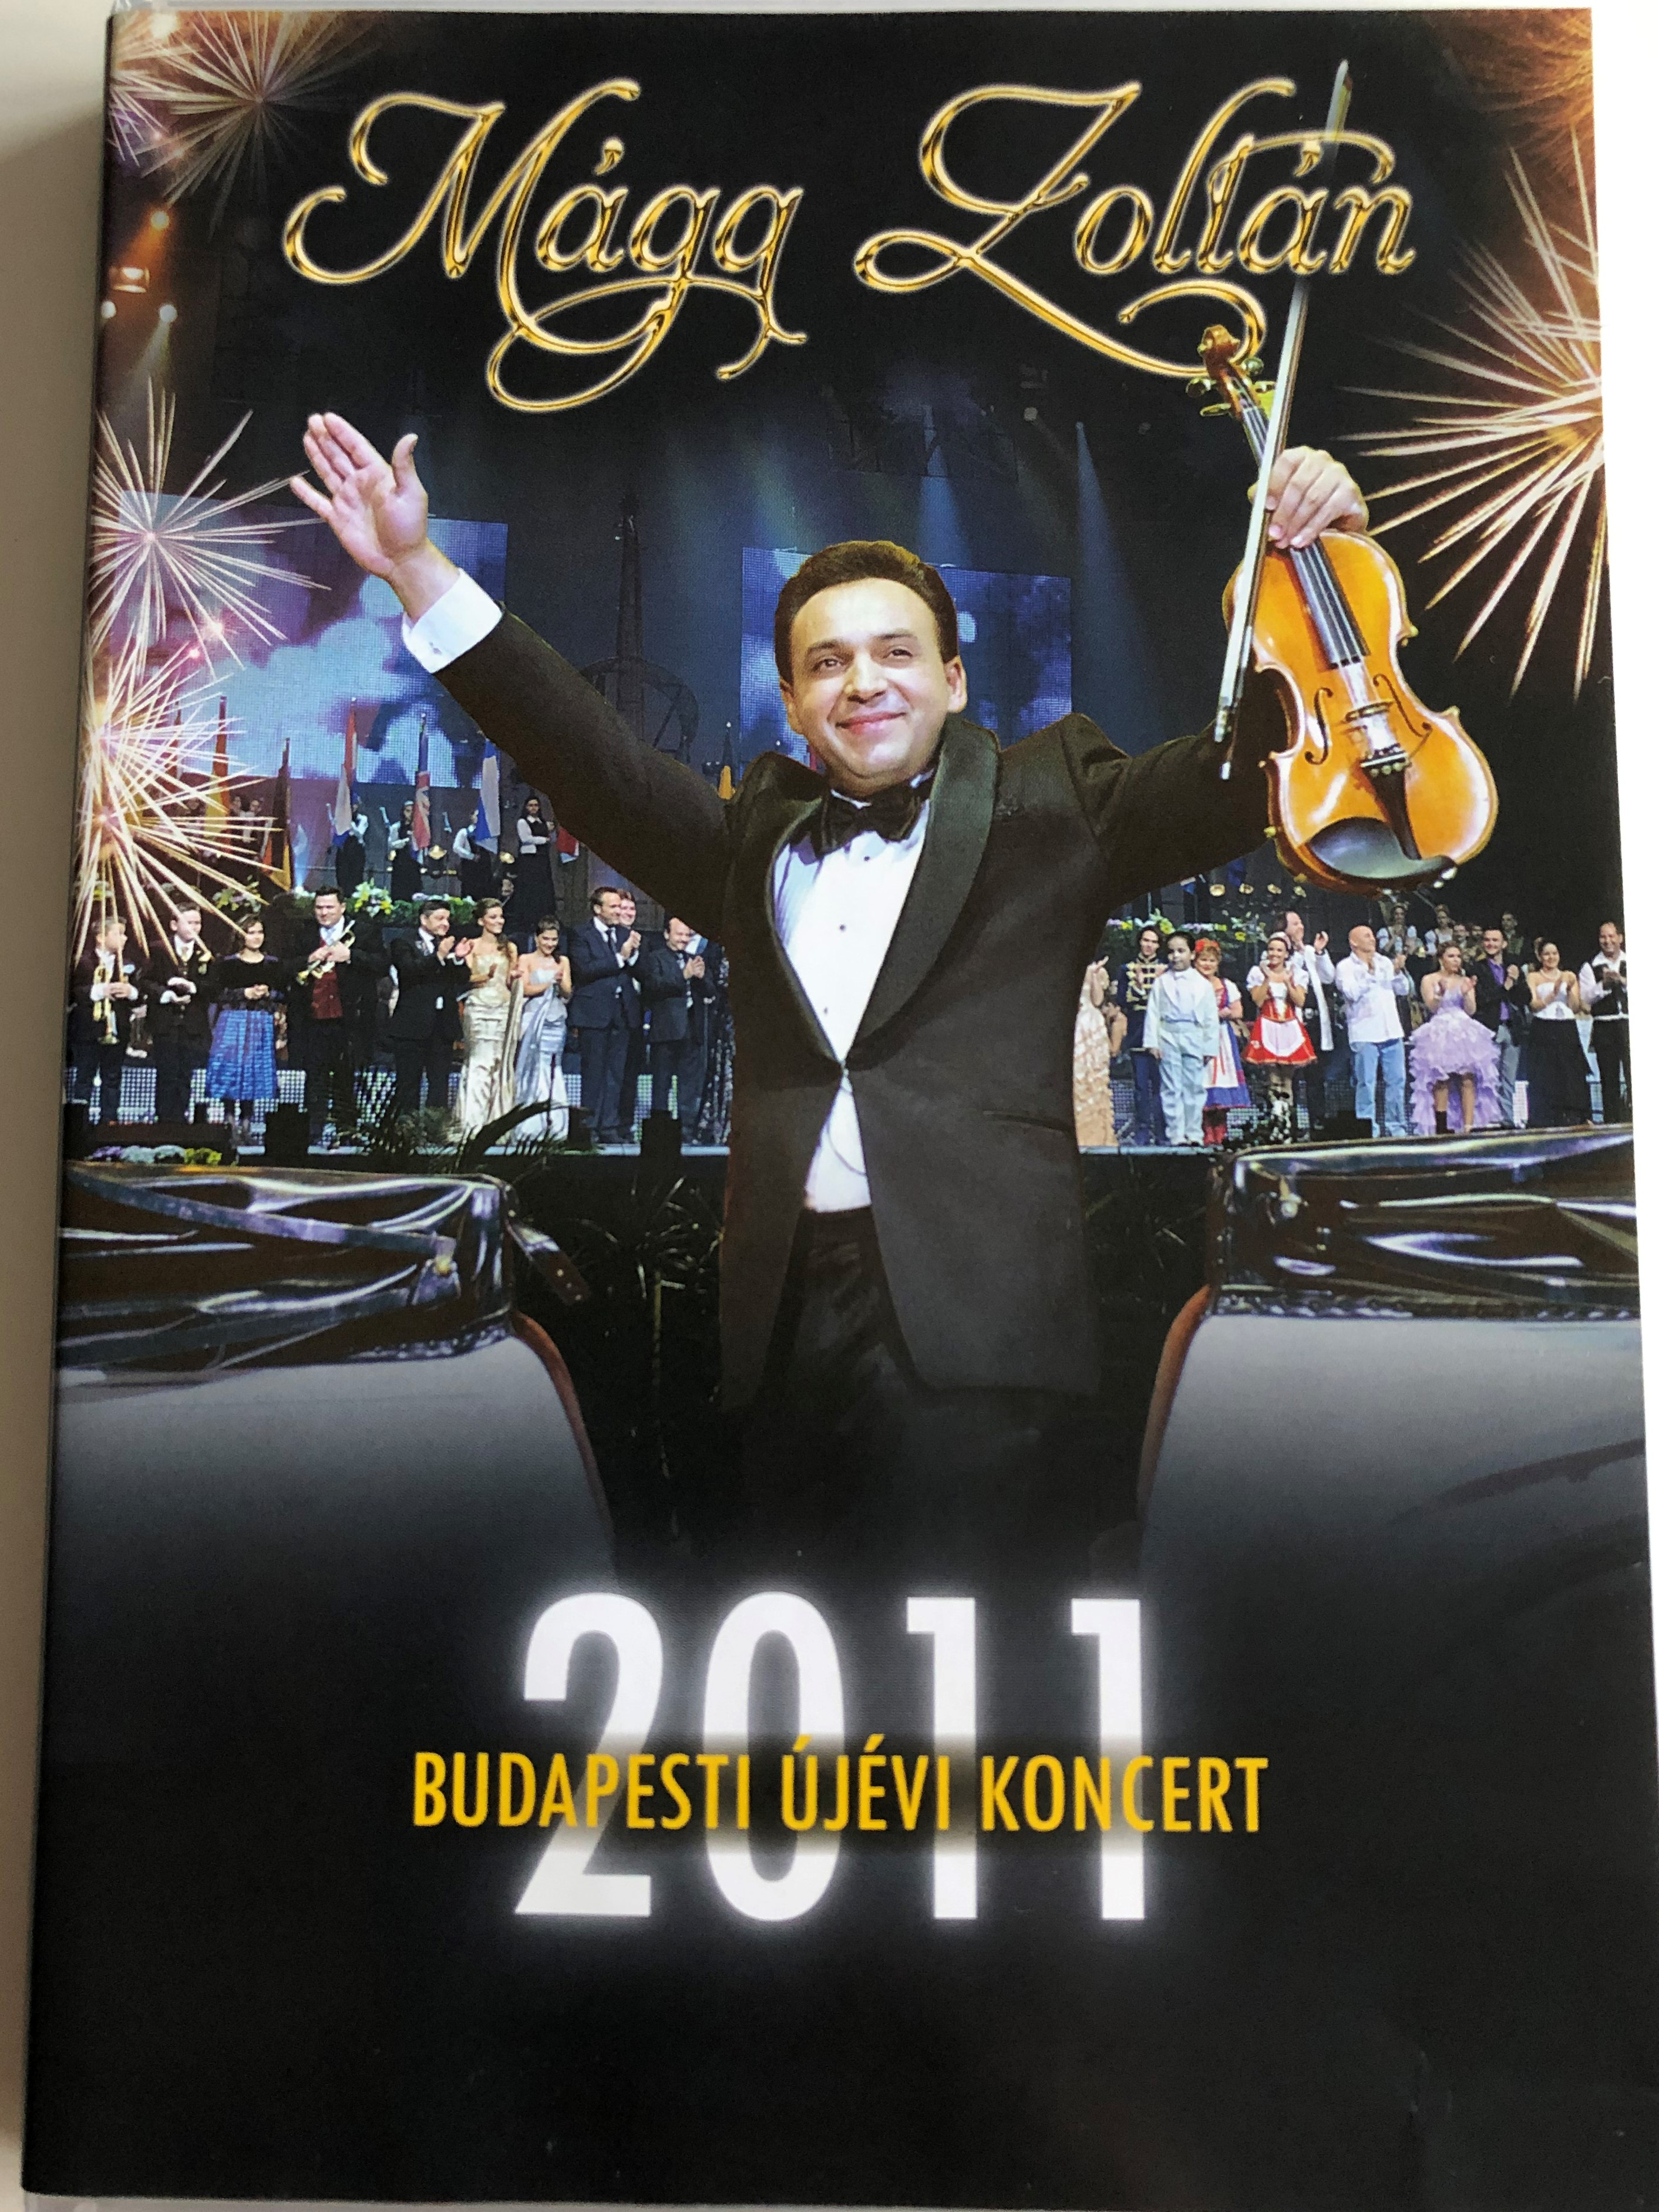 m-ga-zolt-n-2011-budapesti-j-vi-koncert-dvd-2011-tom-tom-records-ttdvd-156-1-.jpg